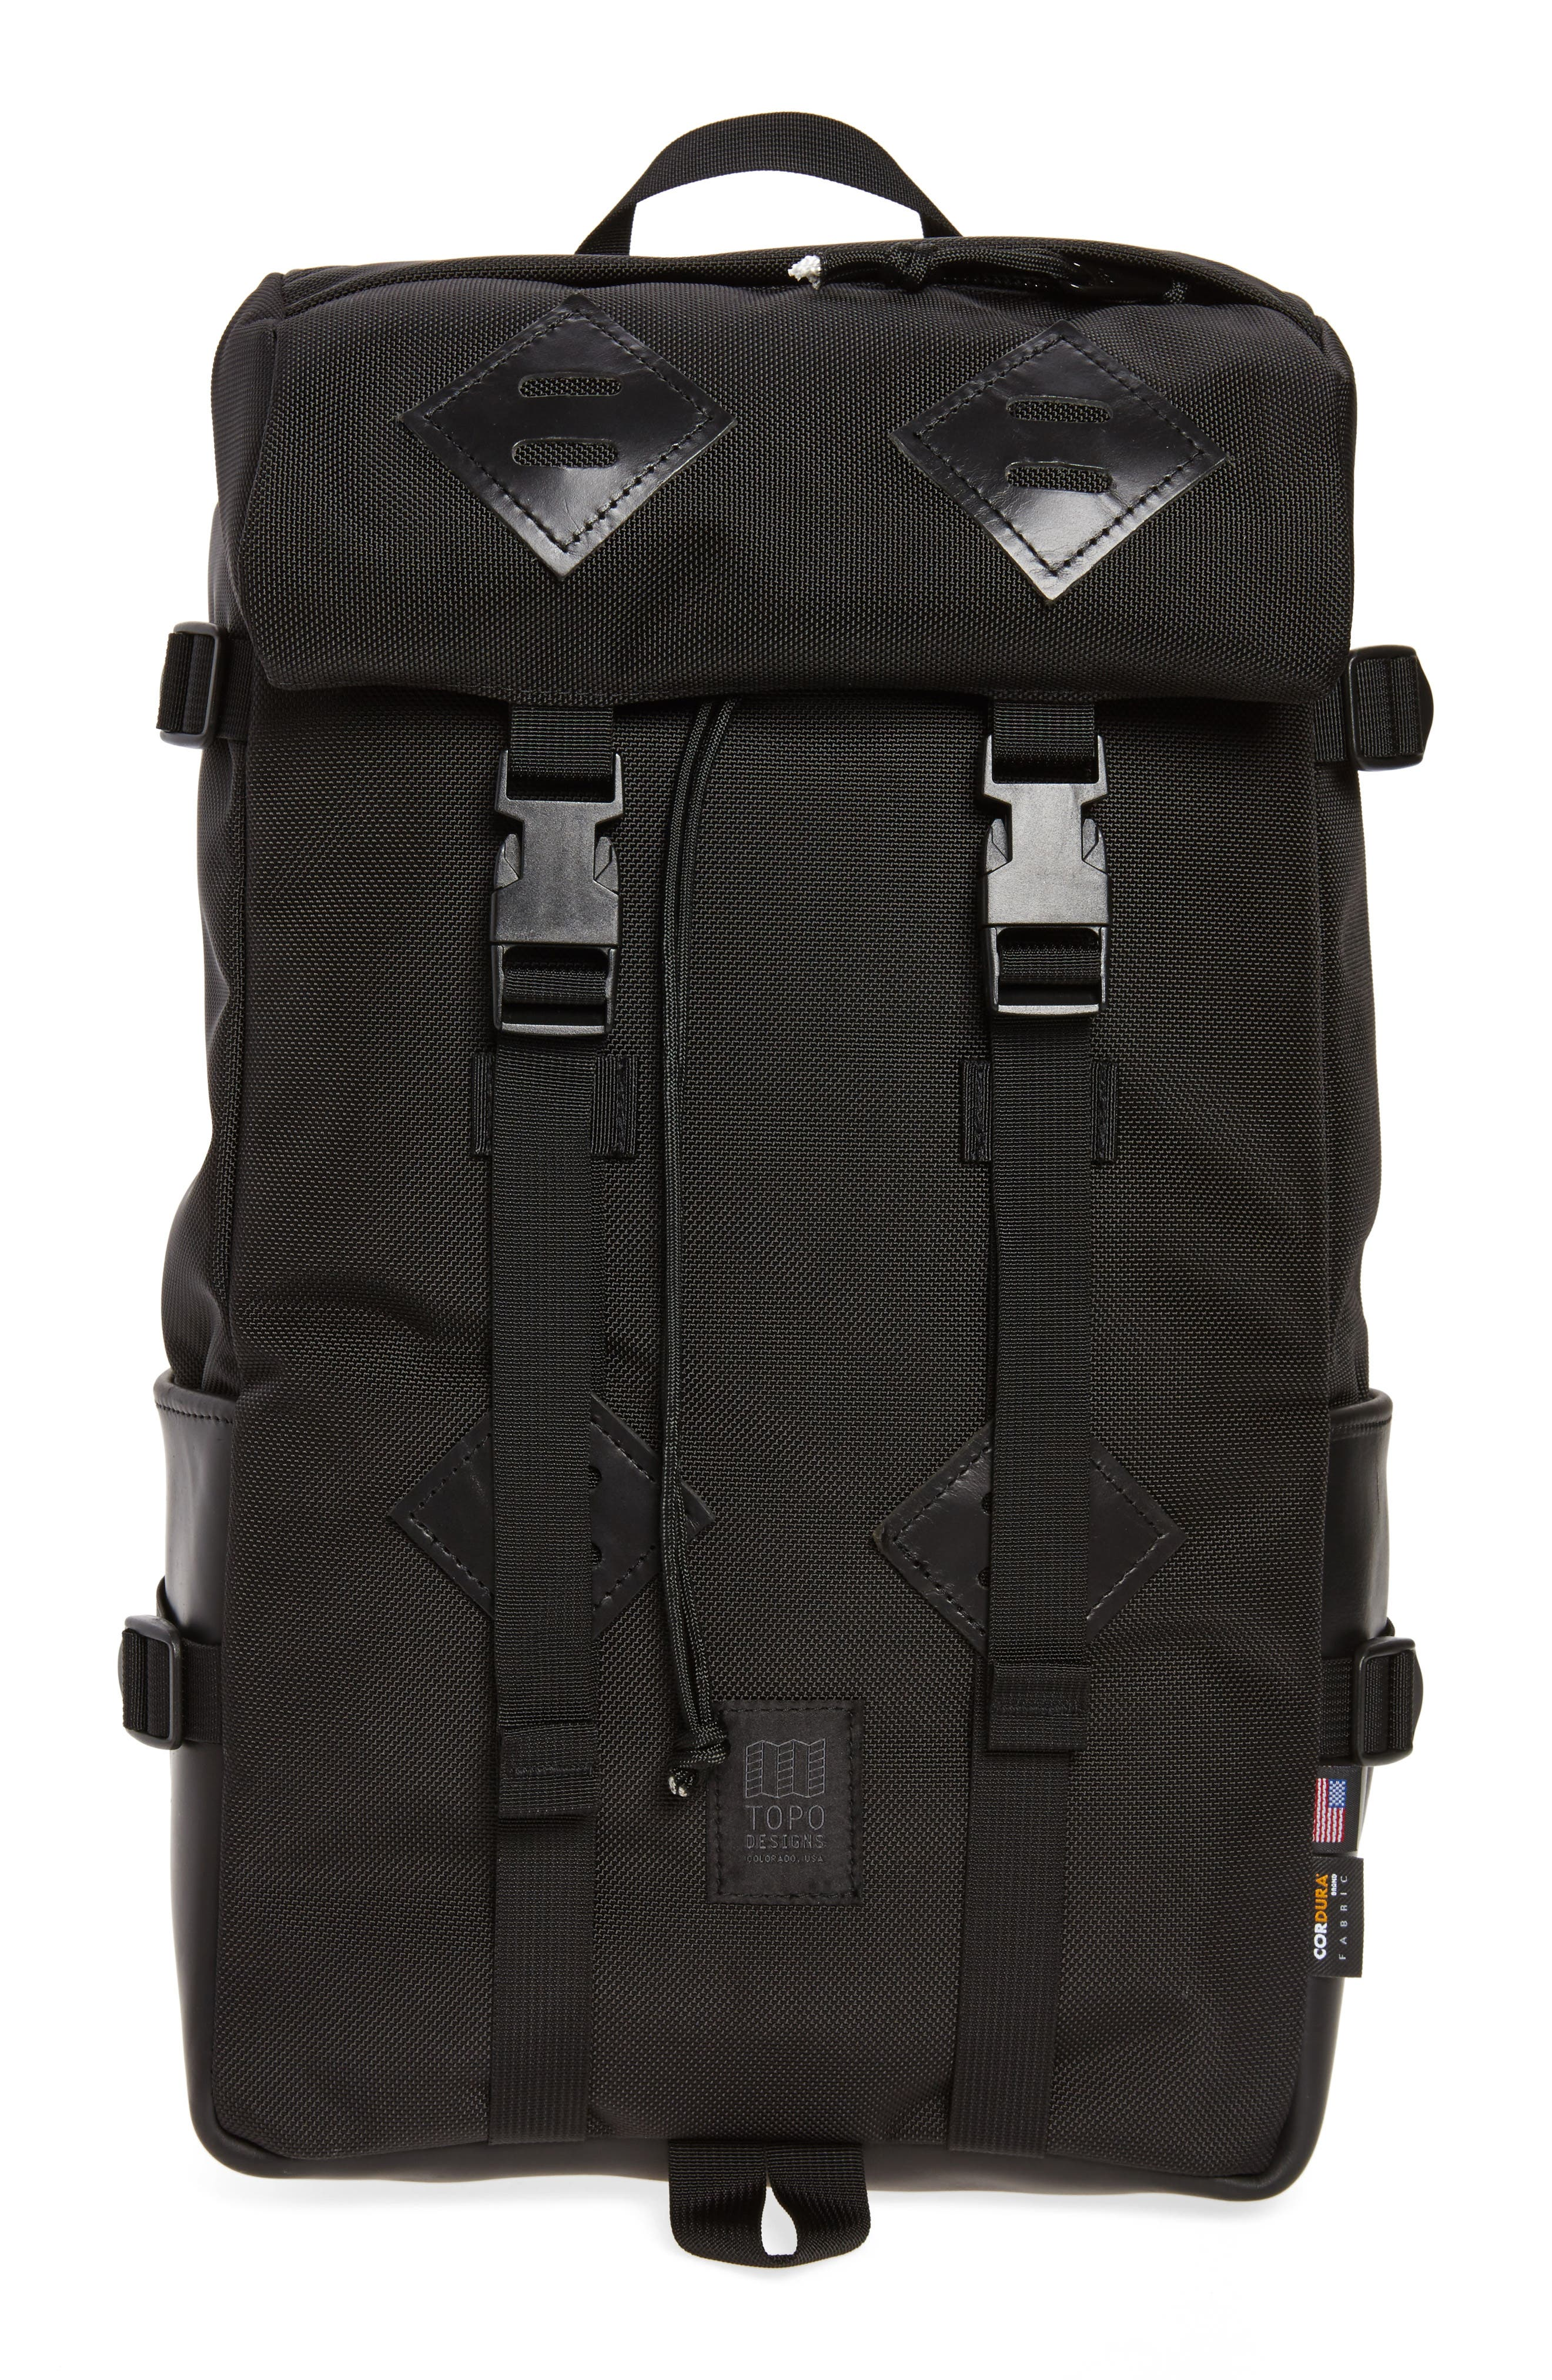 Alternate Image 1 Selected - Topo Designs 'Klettersack' Backpack